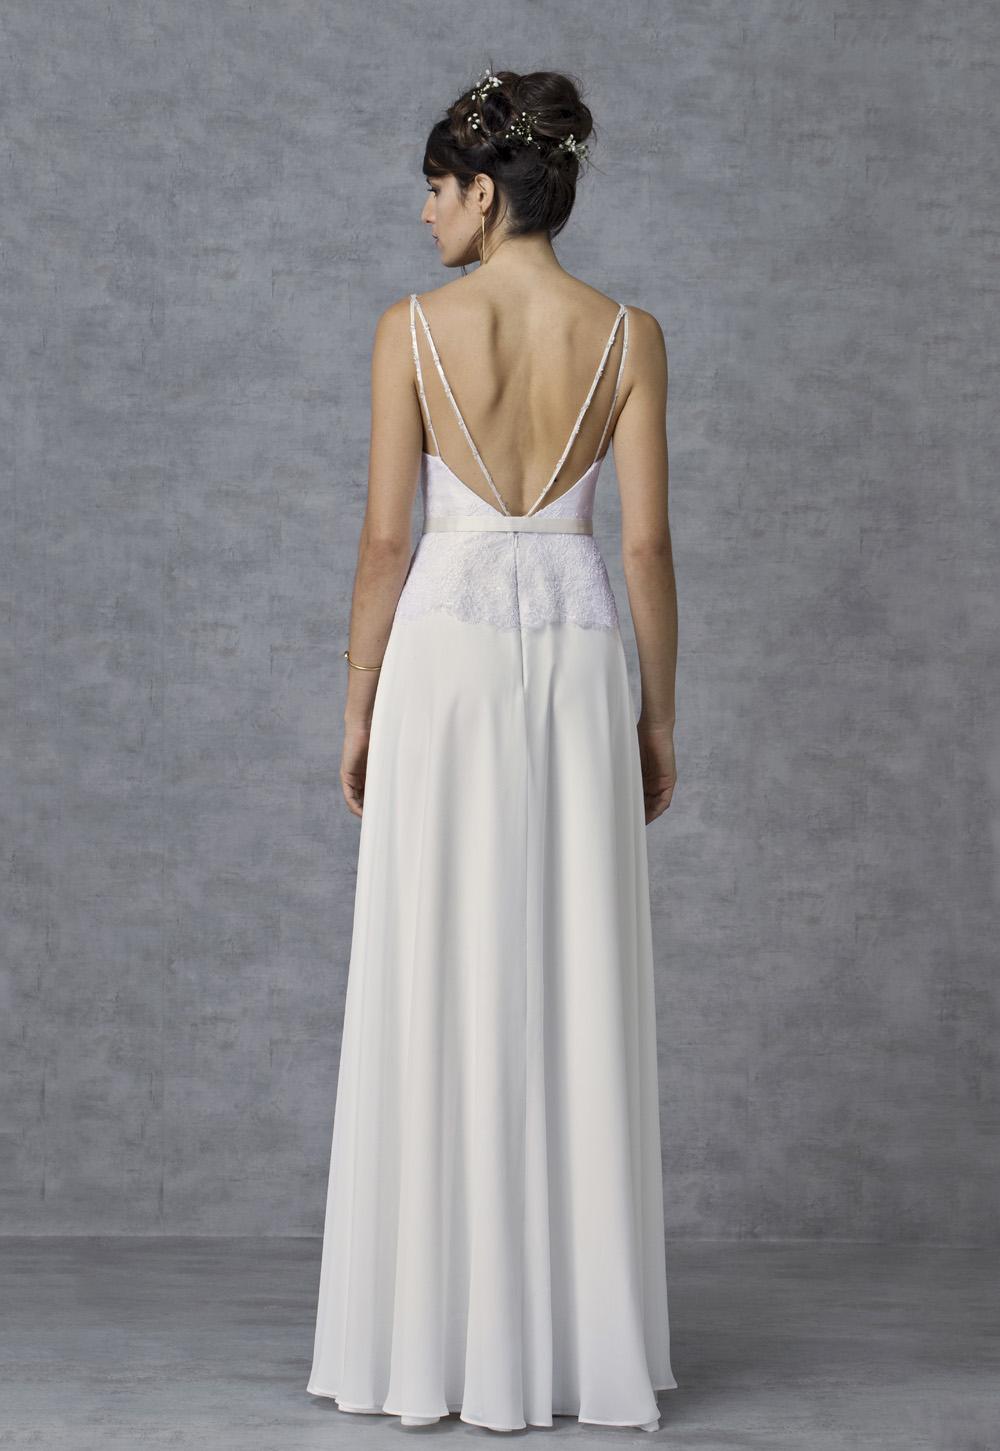 I3A8969 שמלות כלה - שמלה